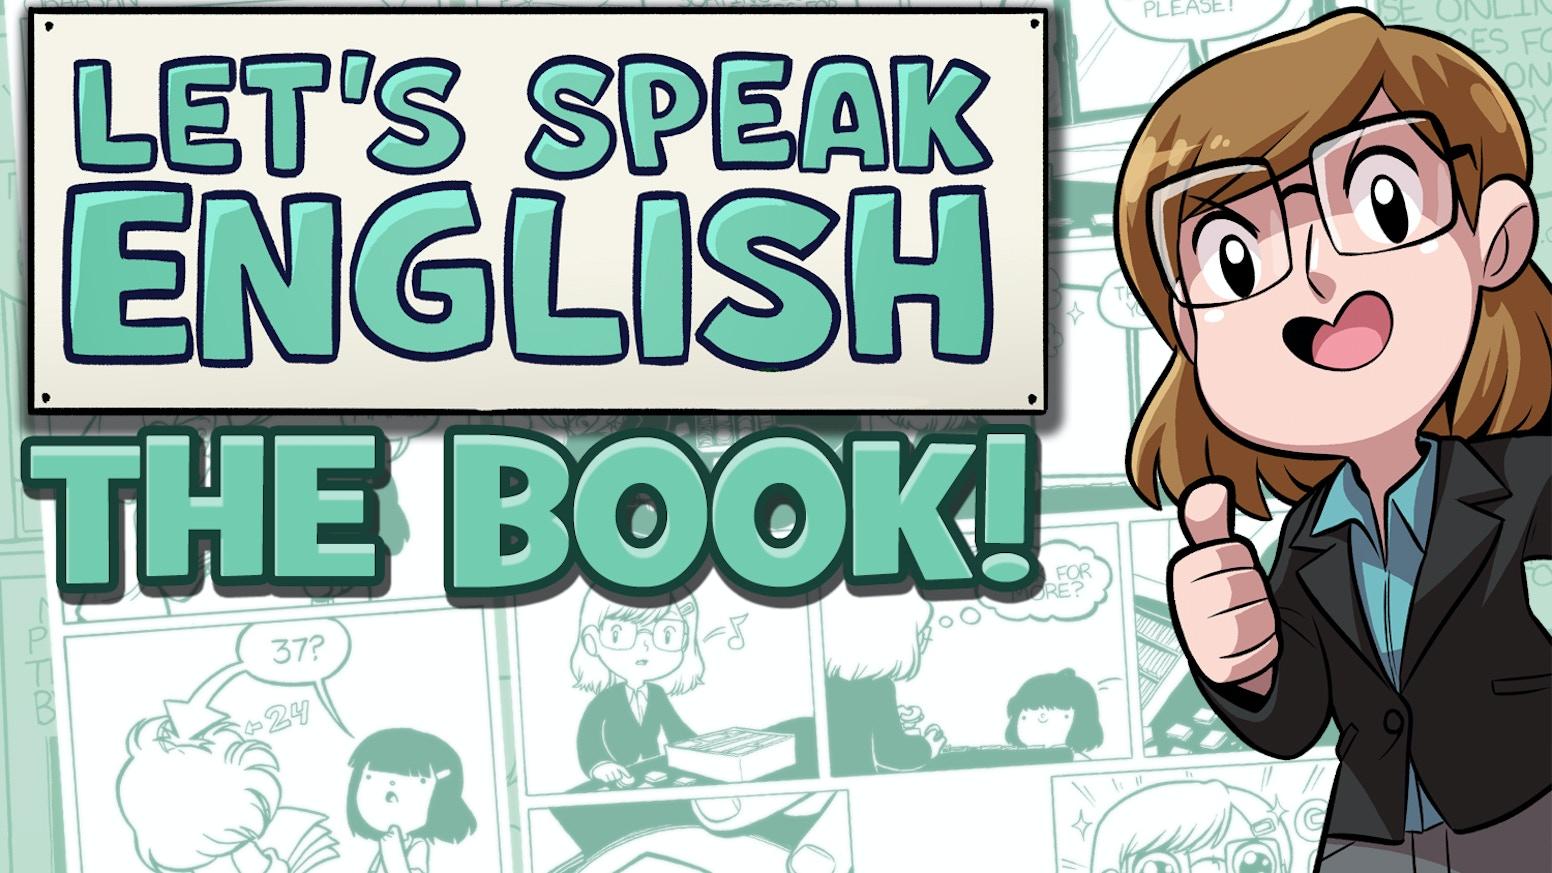 Let's Speak English - The Book!